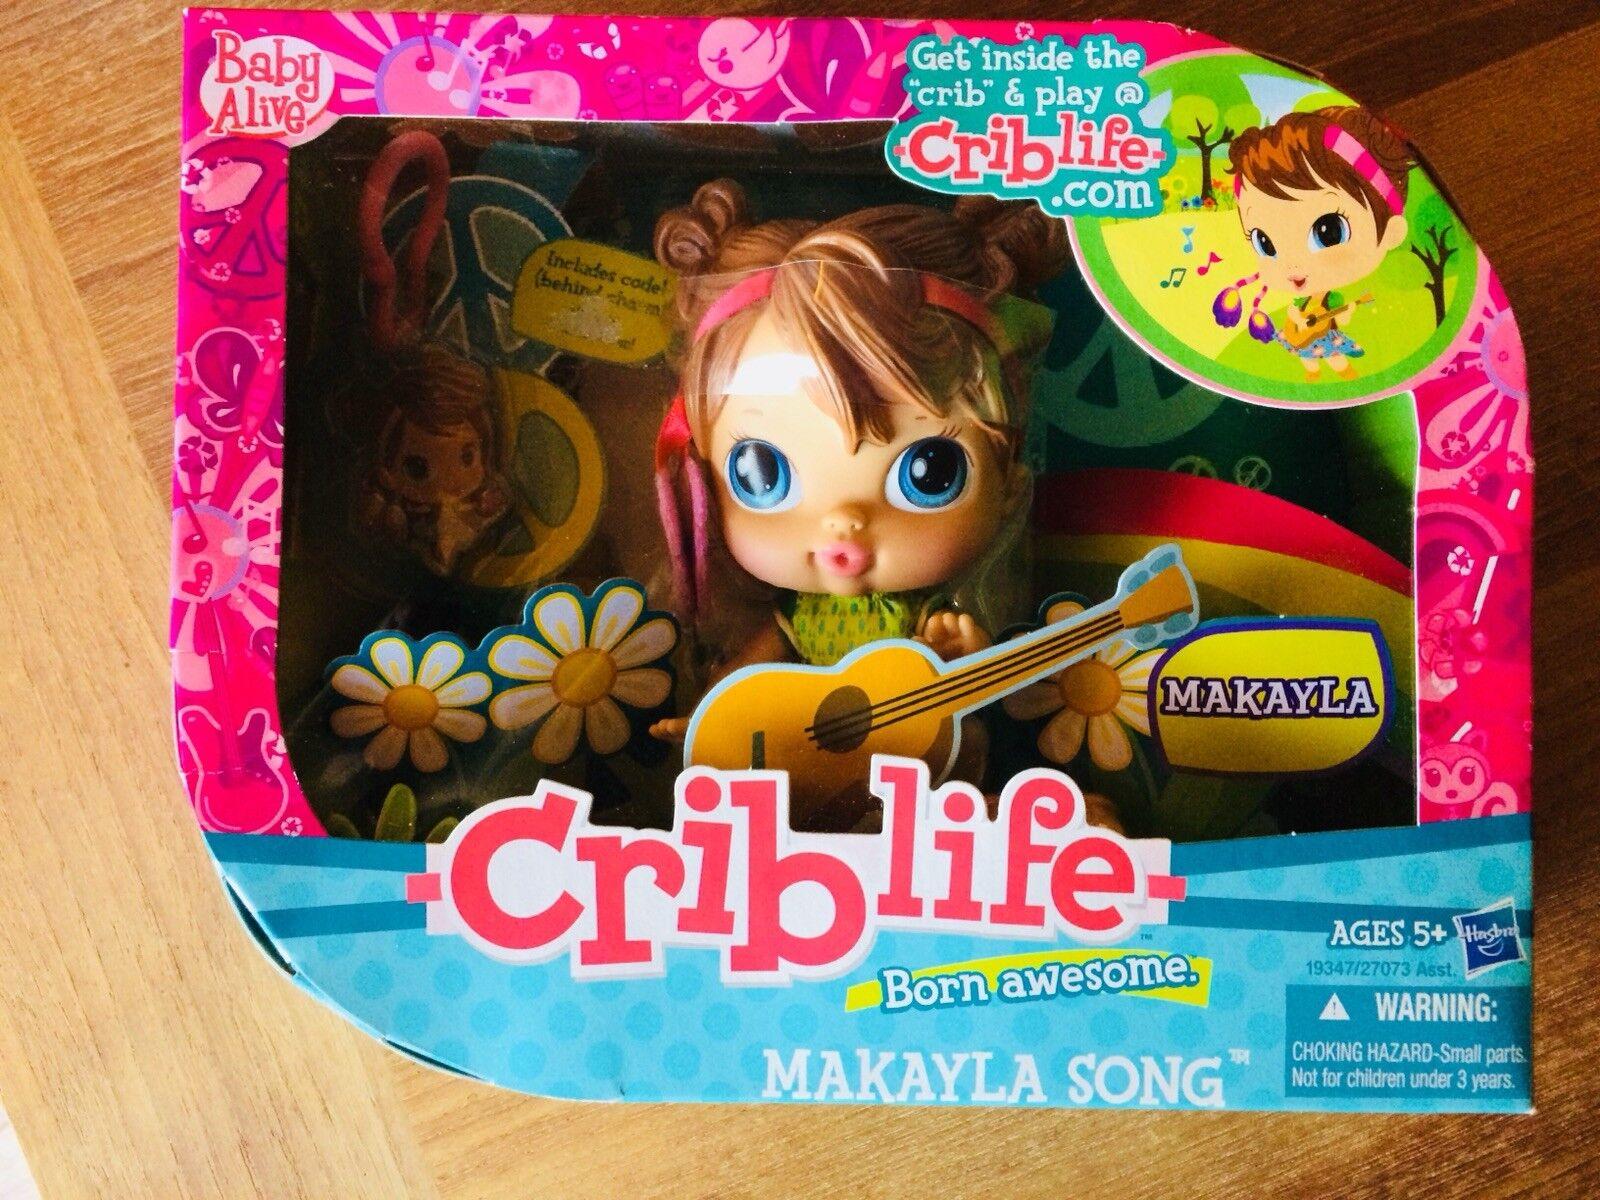 Hasbro 2010 Baby Alive Crib Life Makayla Song Doll Brand New Boxed Rare RetiROT